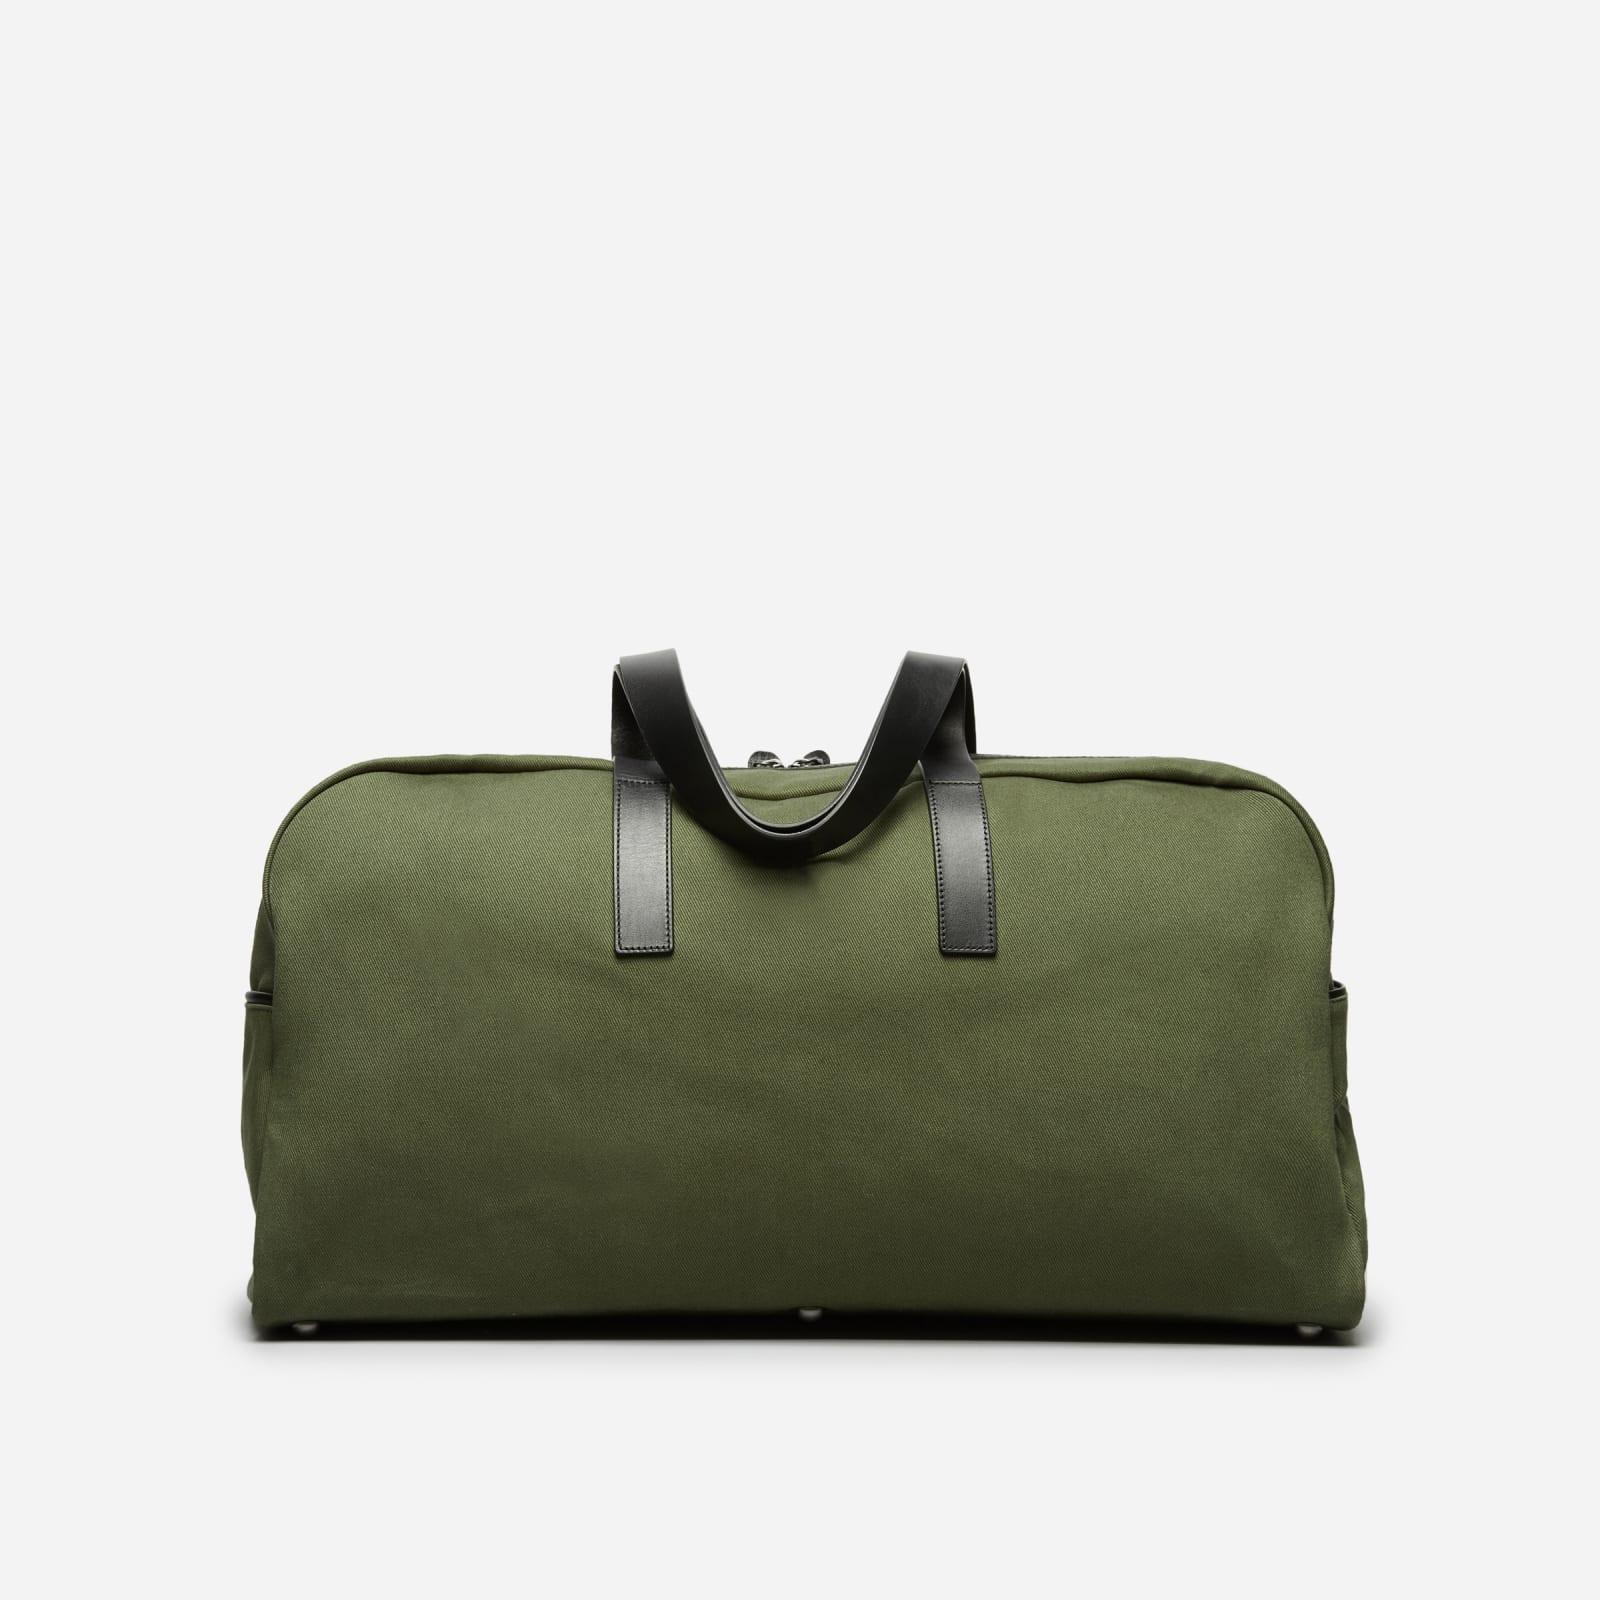 twill weekender bag by everlane in dark green